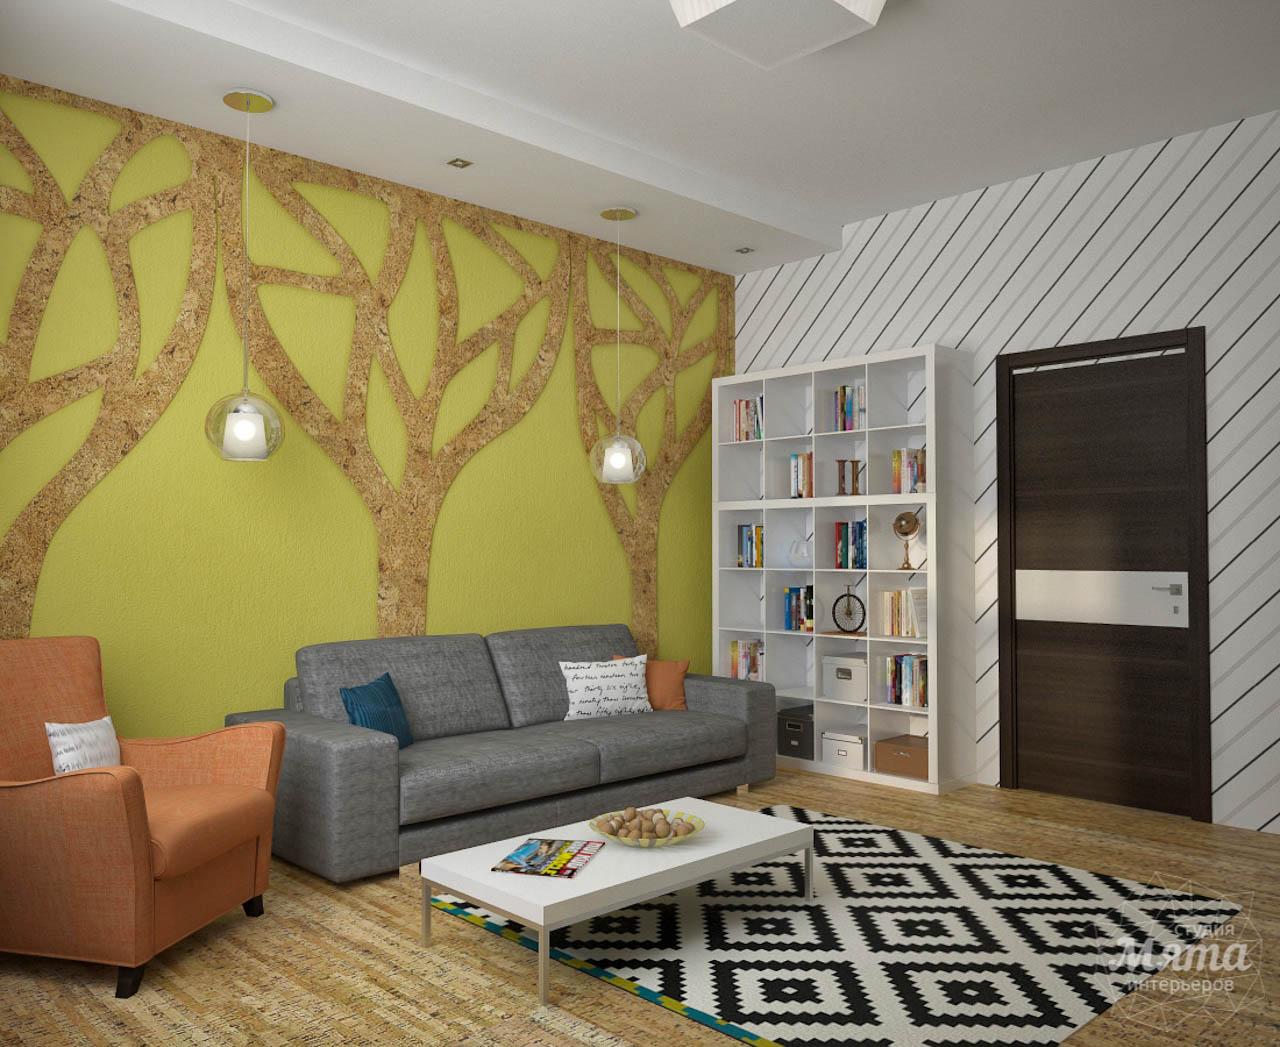 Дизайн проект интерьера коттеджа  в стиле минимализм по ул. Барвинка 15 img506063517